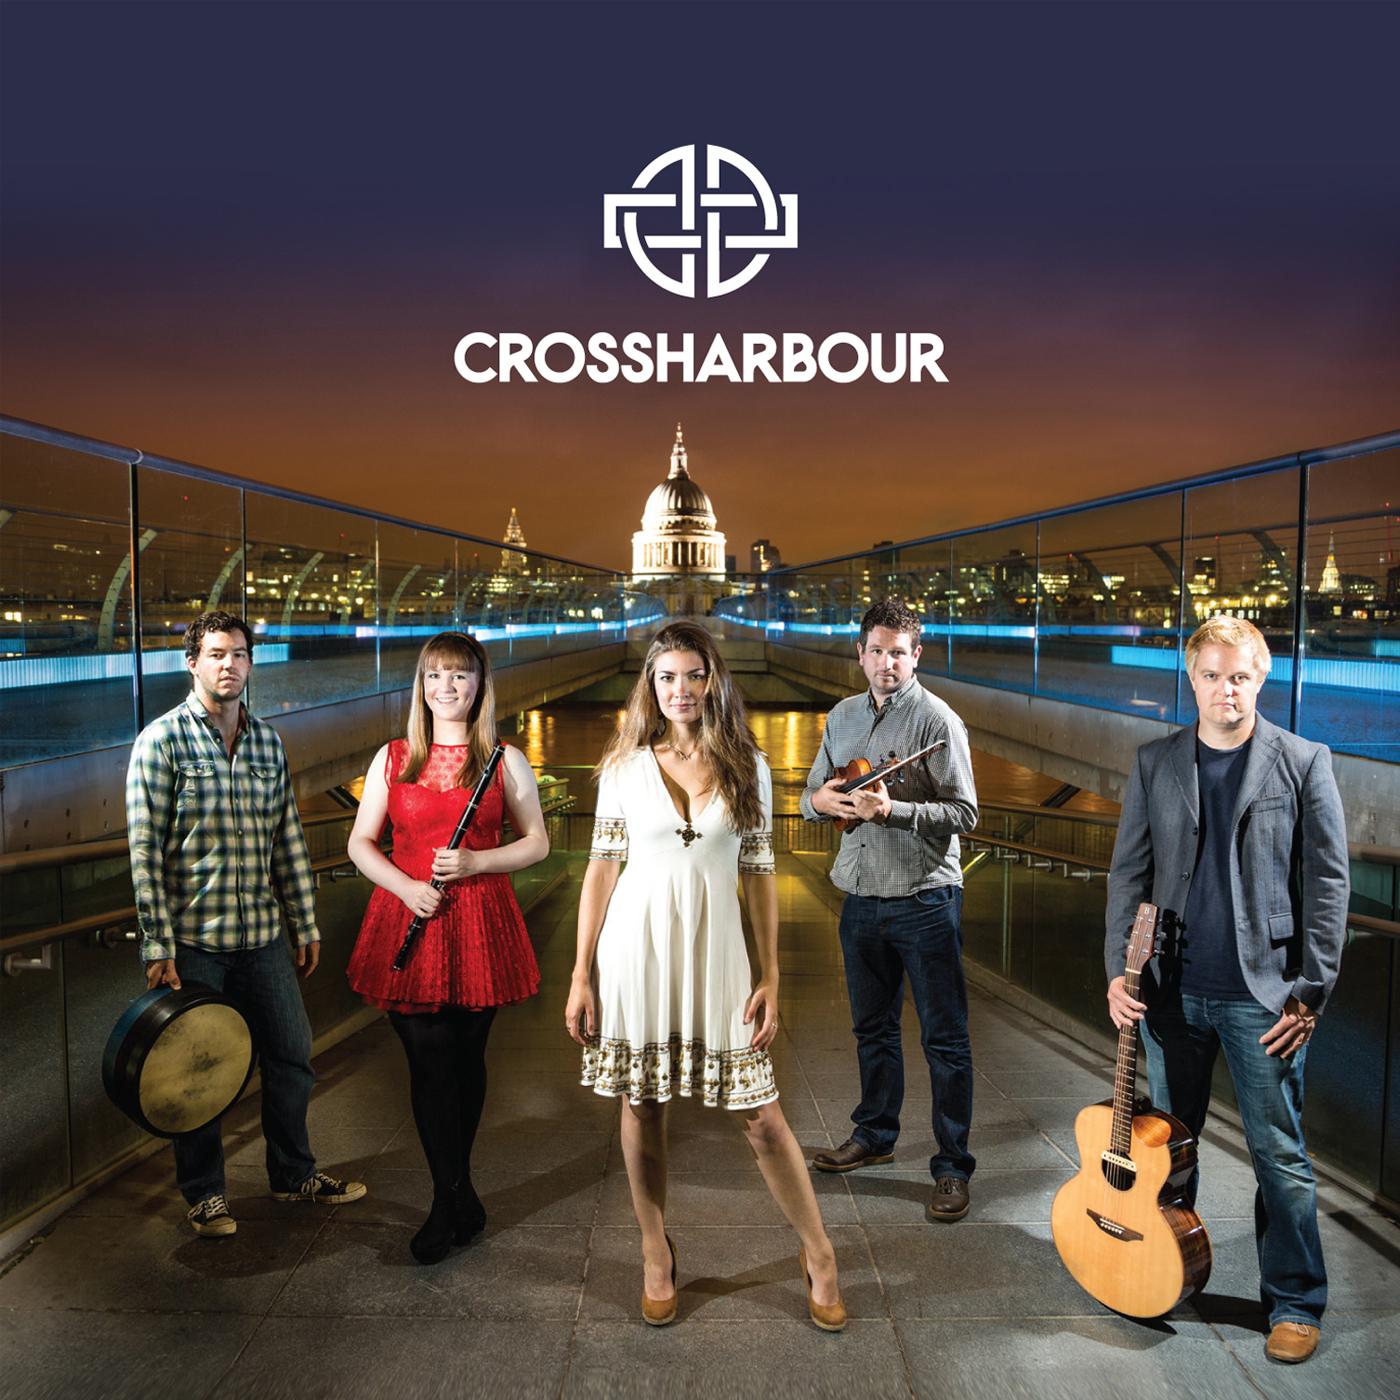 crossharbour музыка торрент